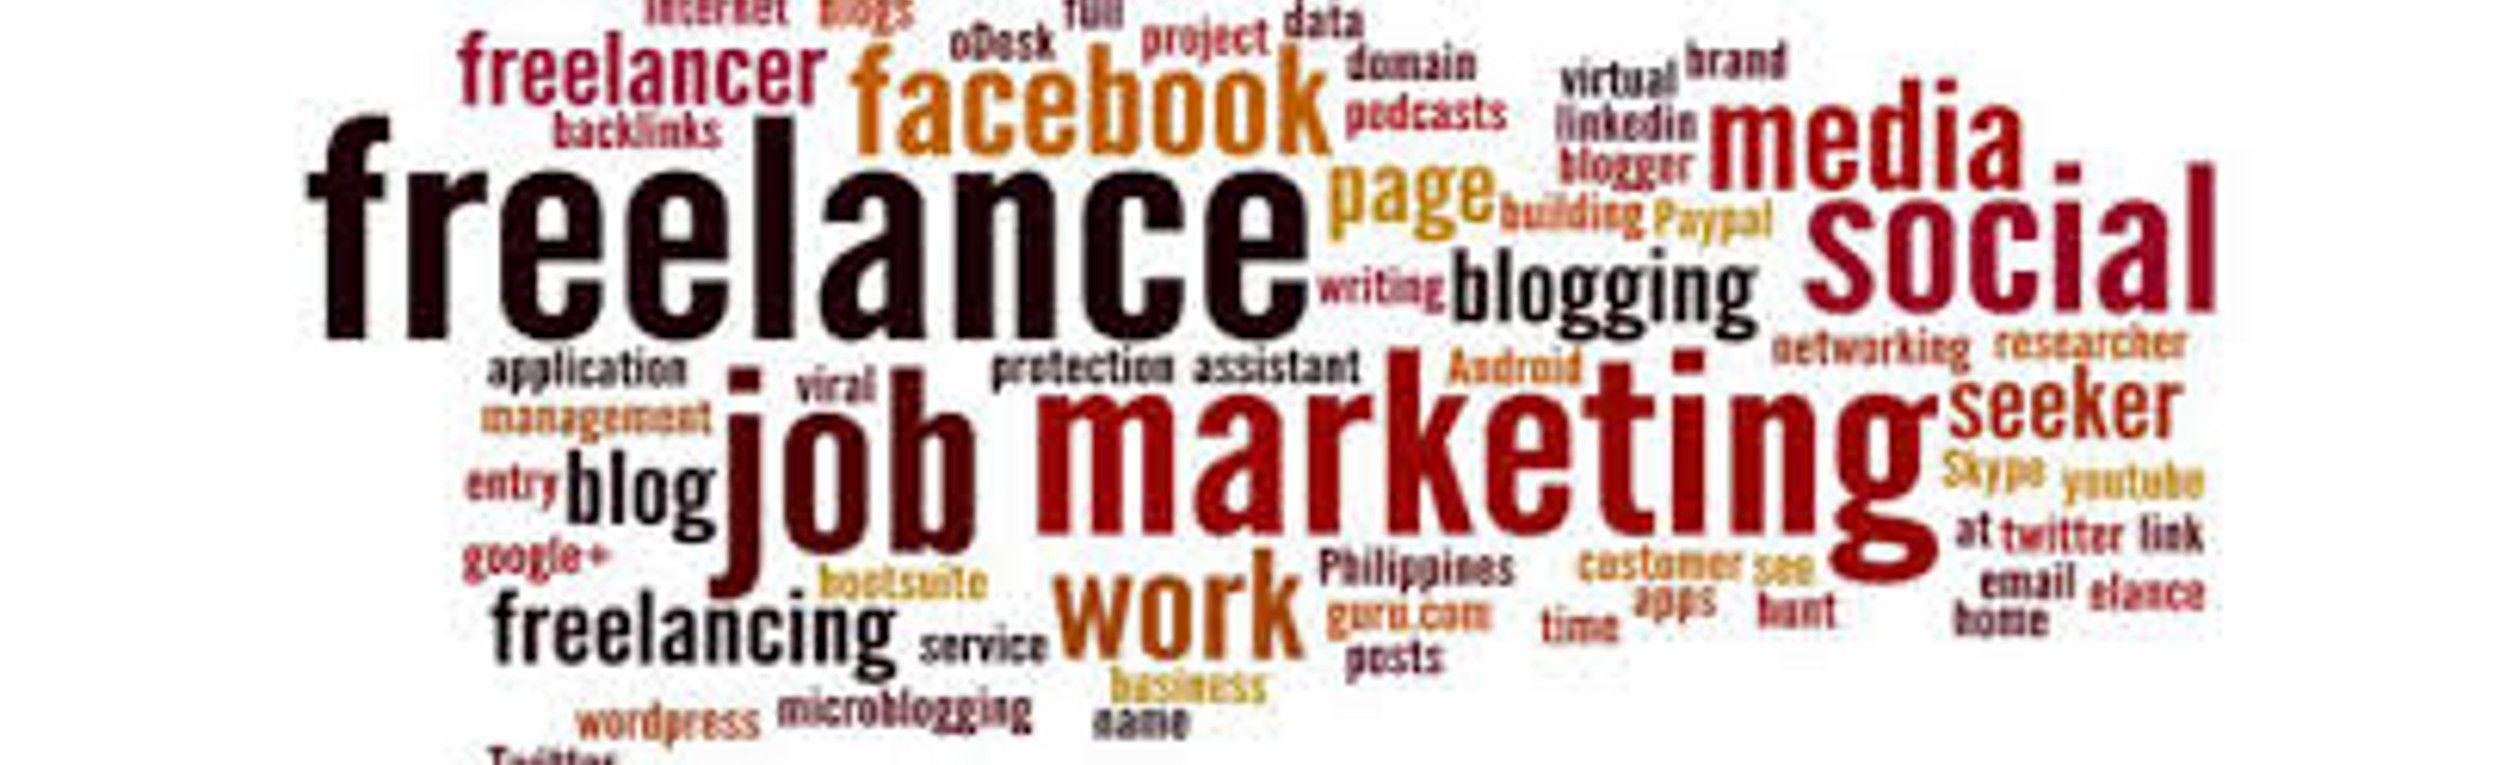 Pdmgrant1 Offer Professional Writing Skills For 5 Bucks For 5 On Fiverr Com Online Data Entry Jobs Marketing Jobs Blogging Networks